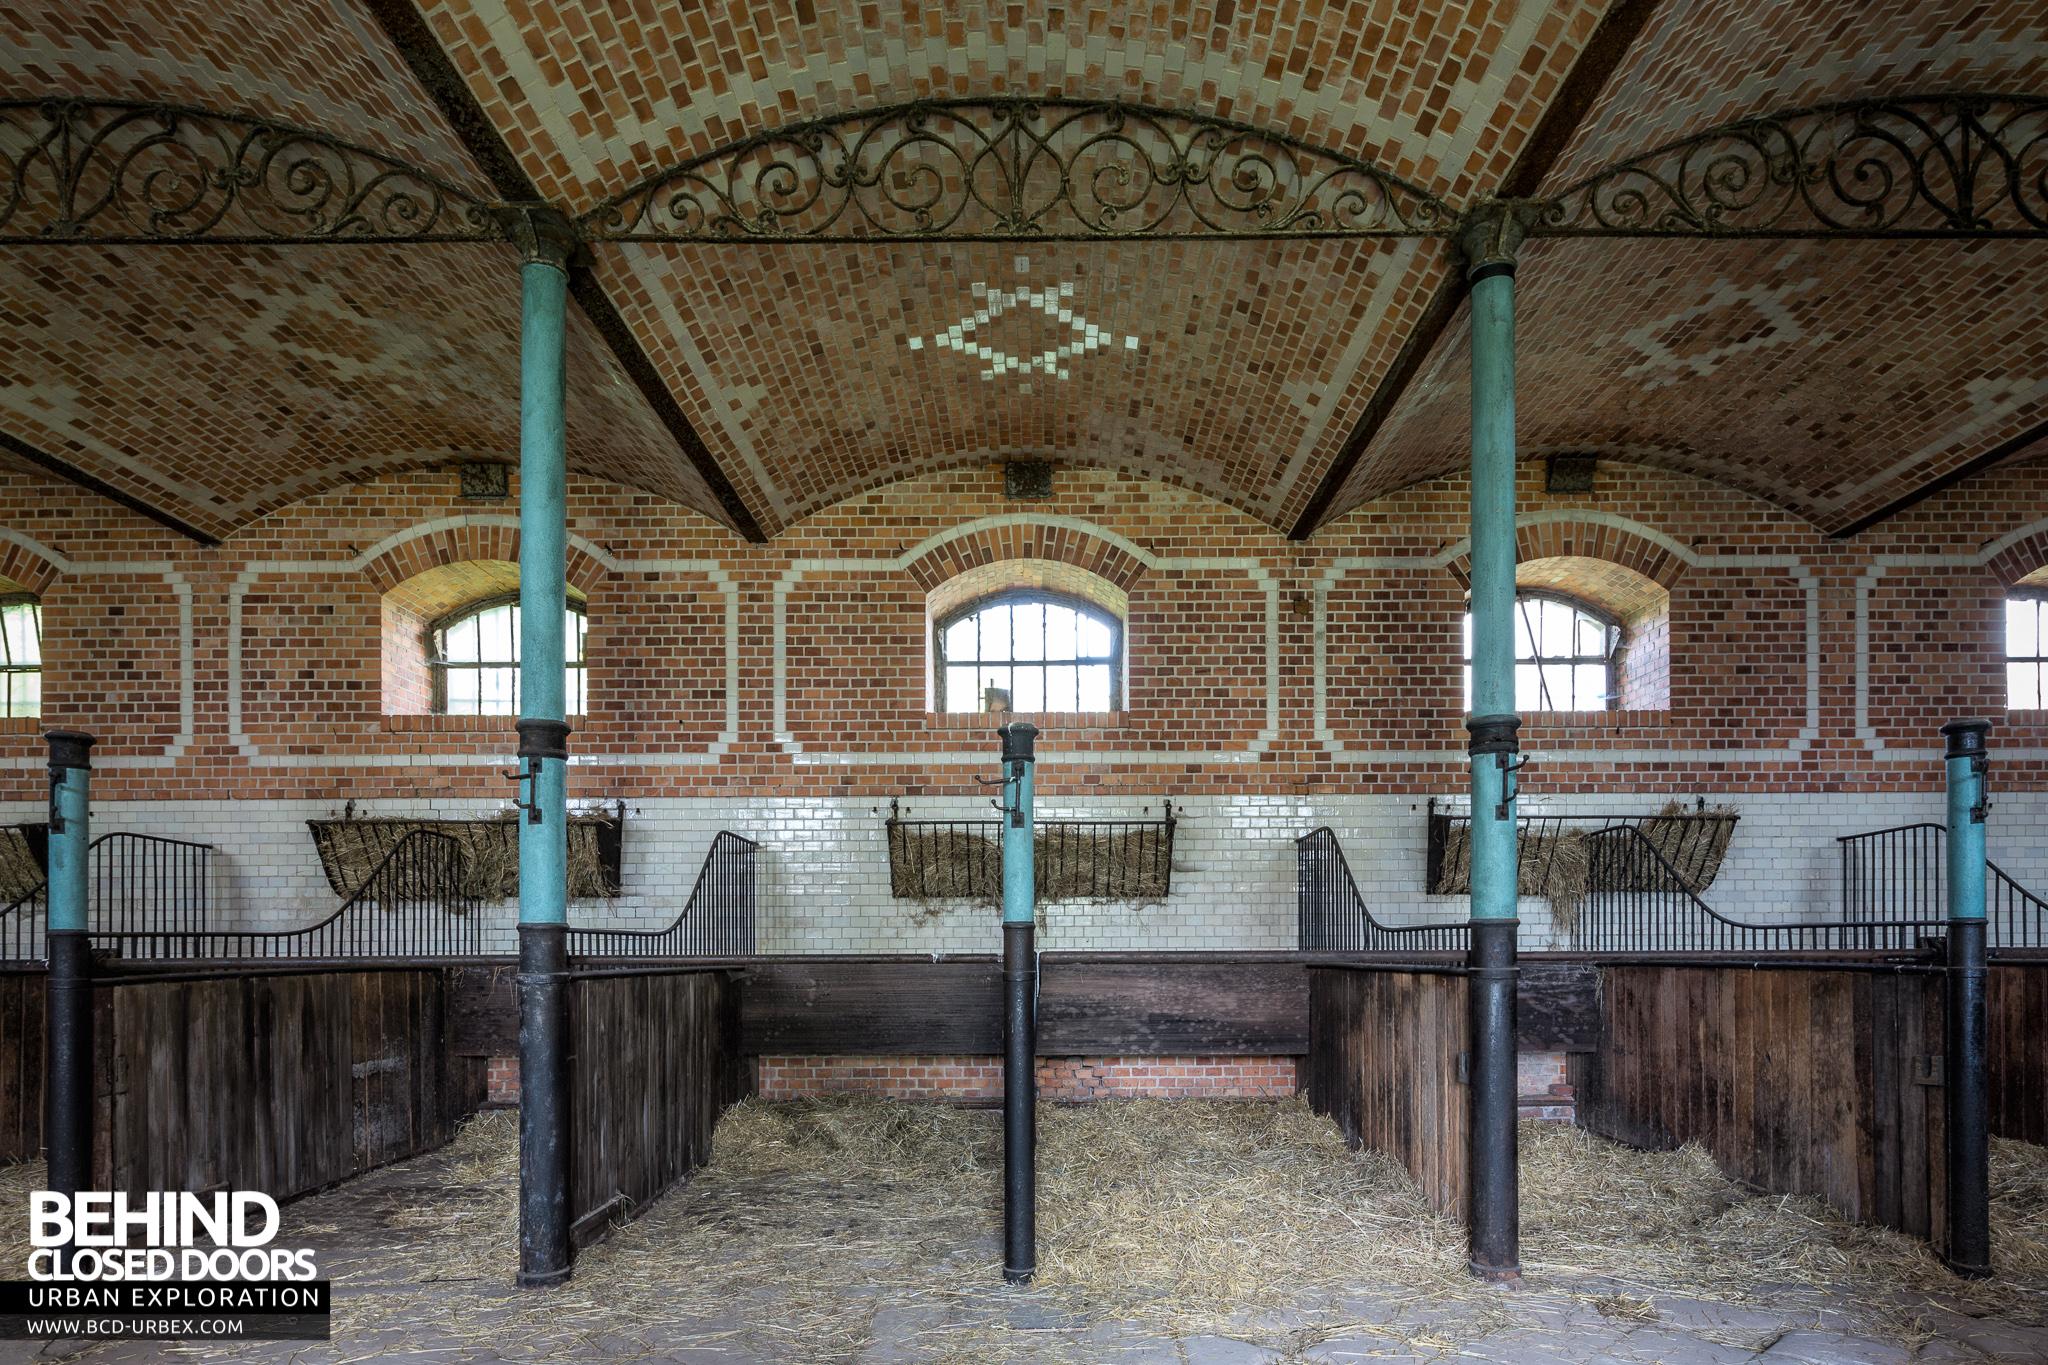 Schloss V Abandoned Castle Germany 187 Urbex Behind